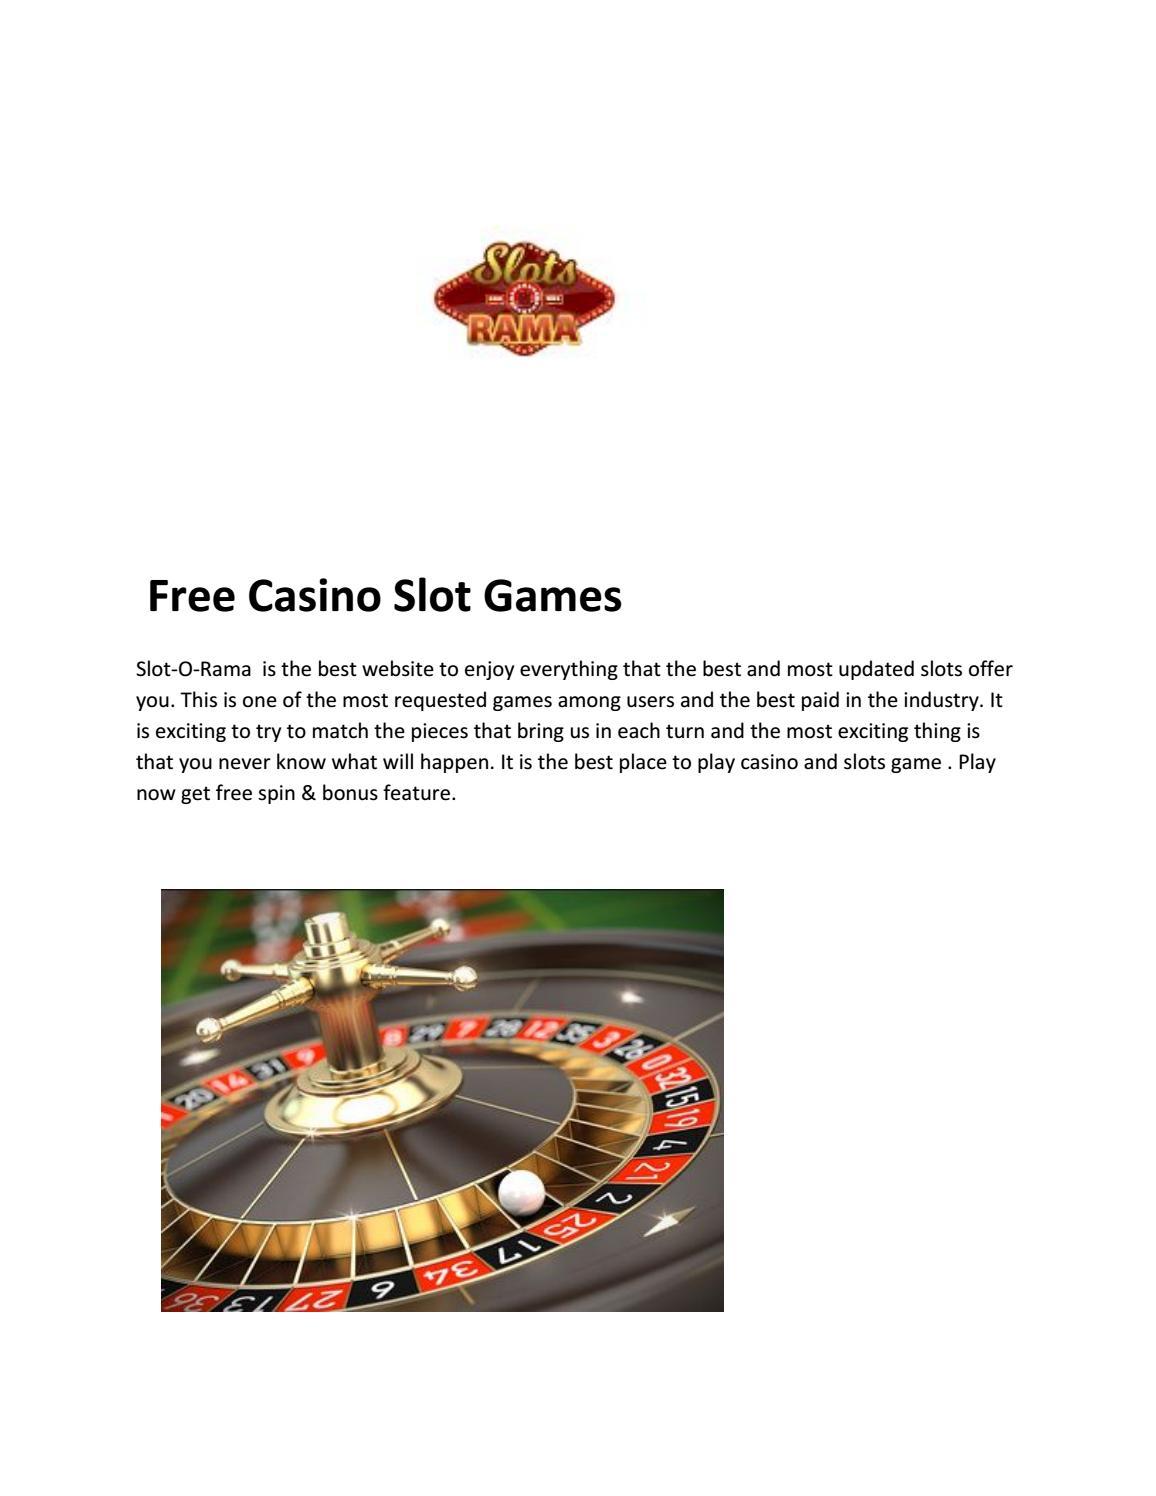 free slot machines casino online slots games